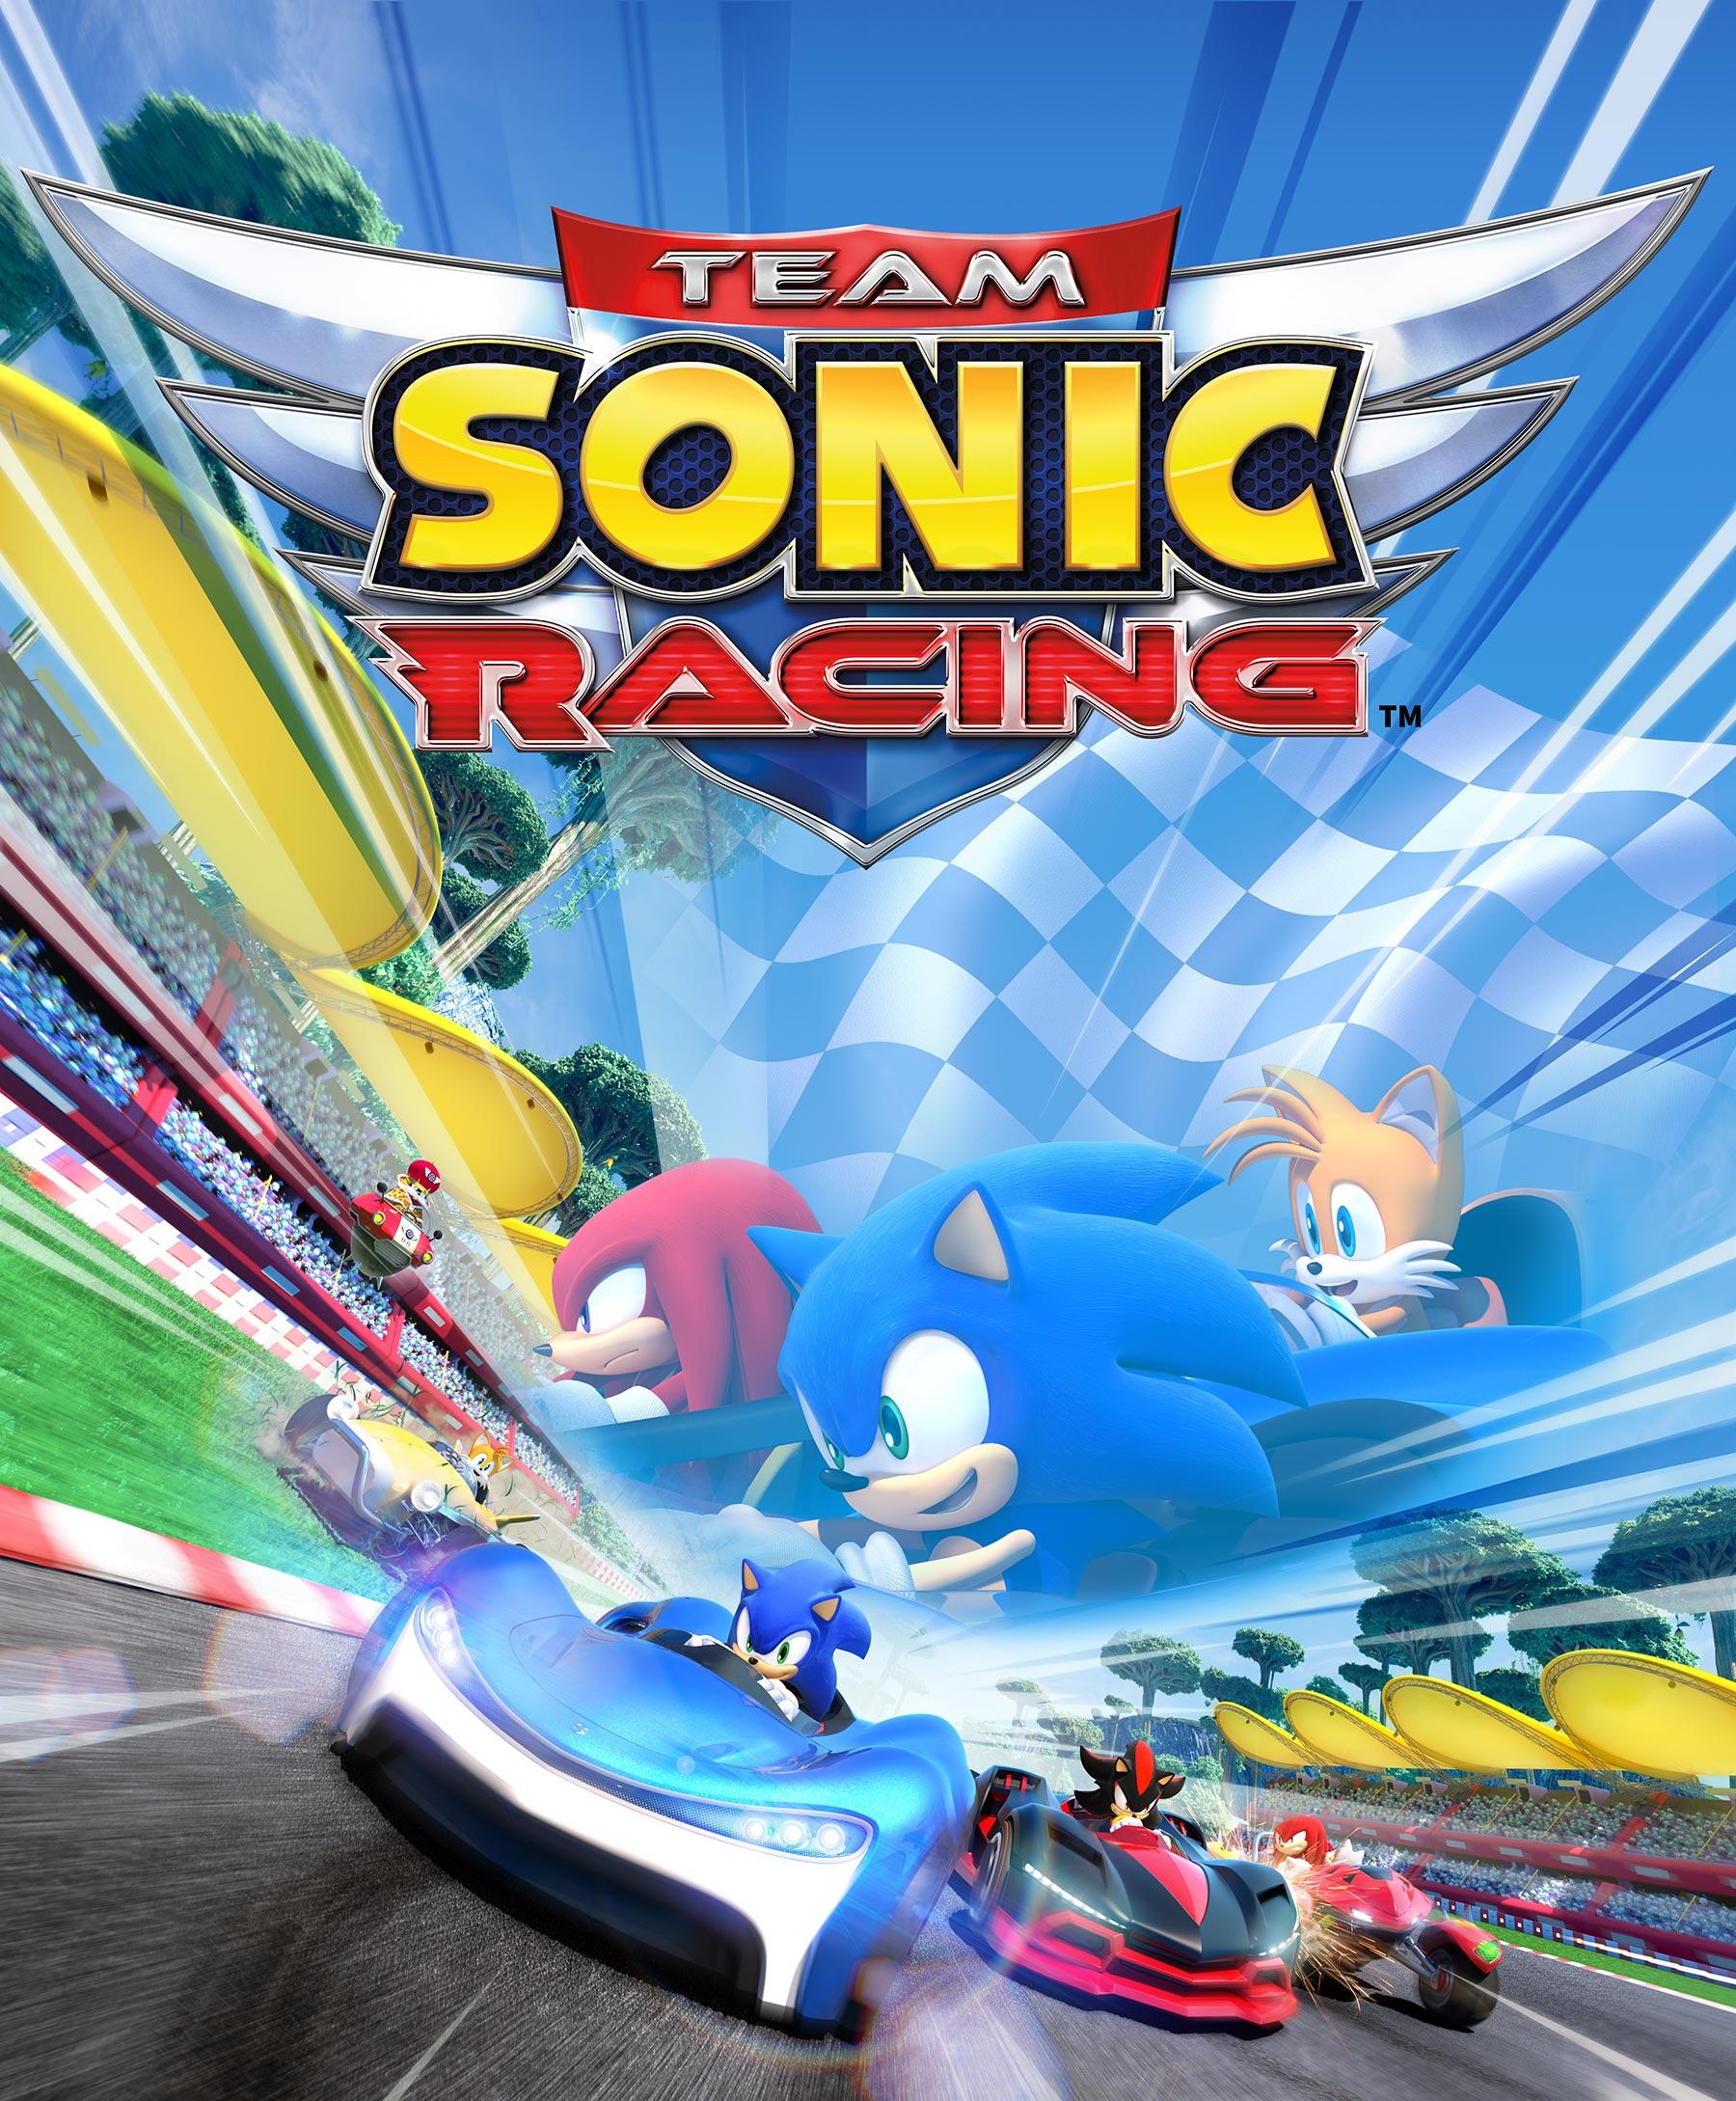 [Steam] Team Sonic Racing - £8.81 - 2Game (Sonic & SEGA All-Stars Racing - 94p)